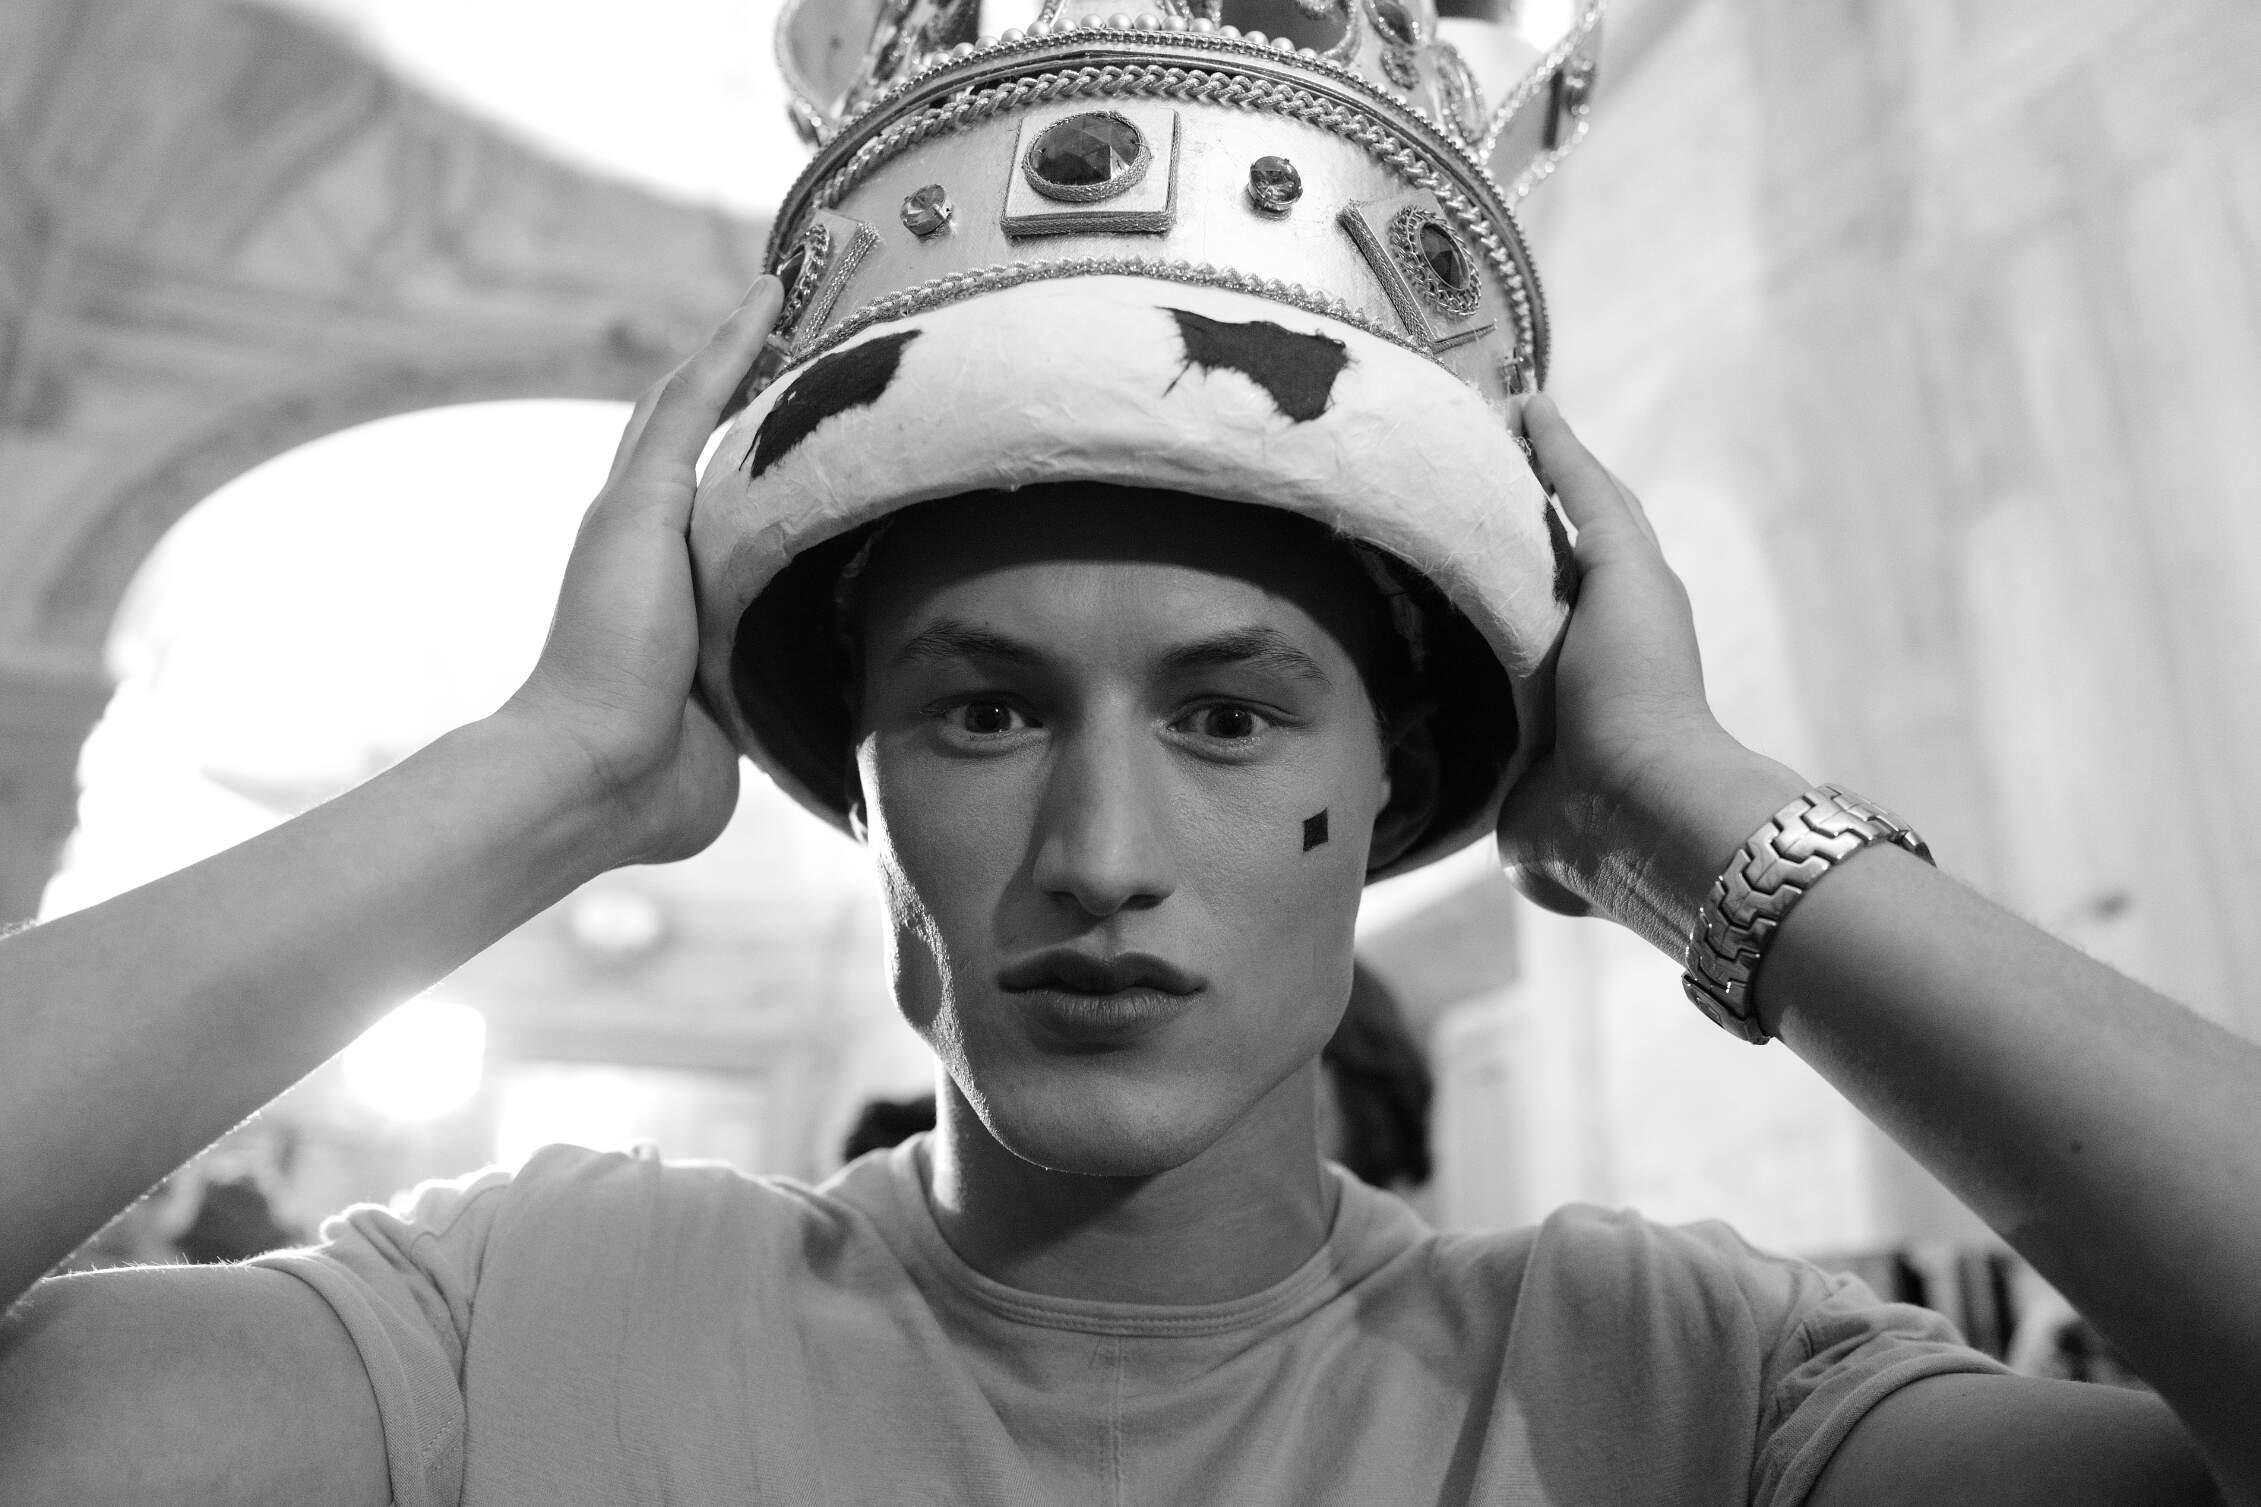 Model Backstage Moschino Pitti Uomo